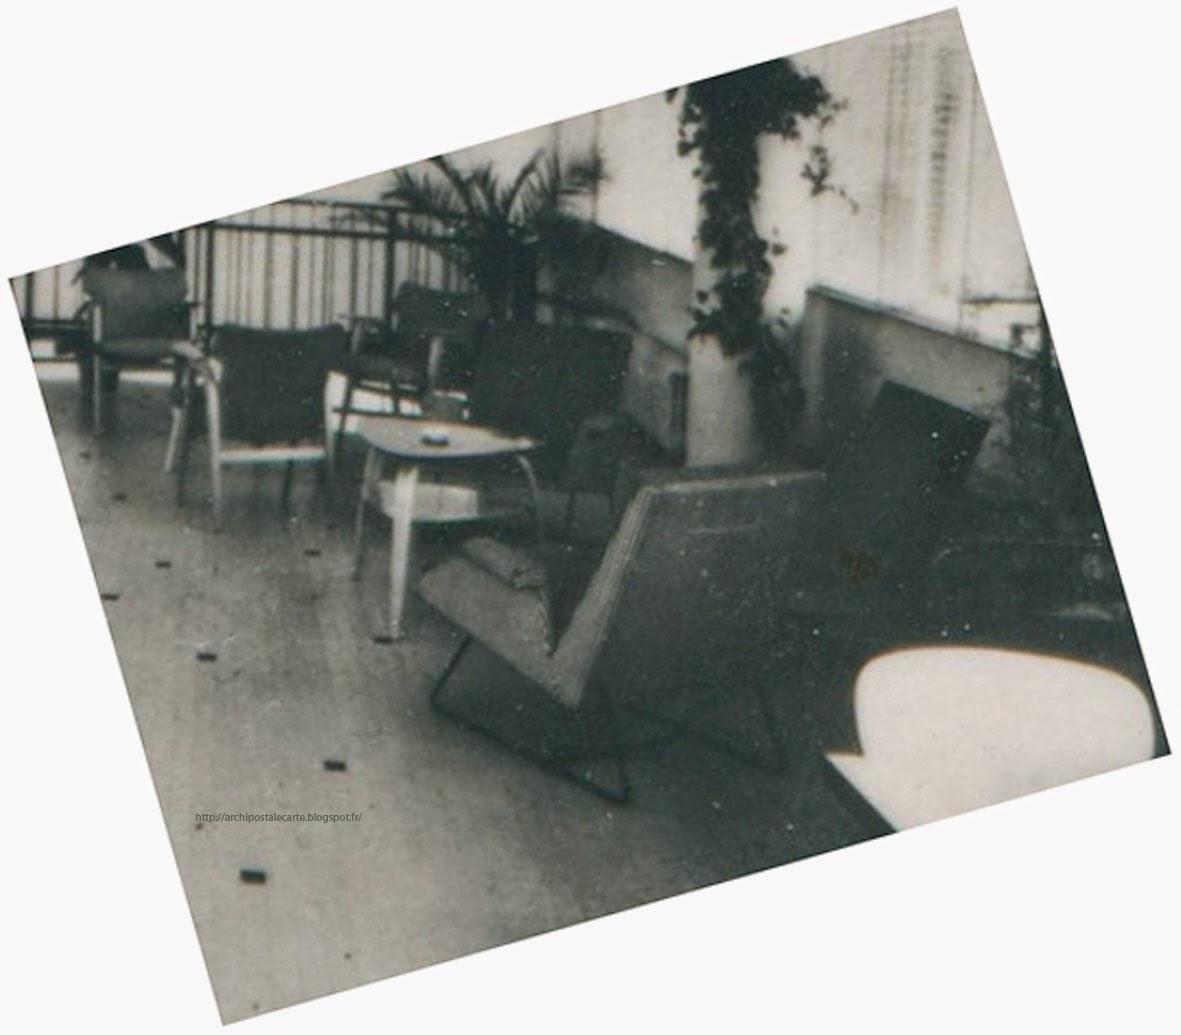 architectures de cartes postales 2 charlotte perriand pour meubler royan. Black Bedroom Furniture Sets. Home Design Ideas